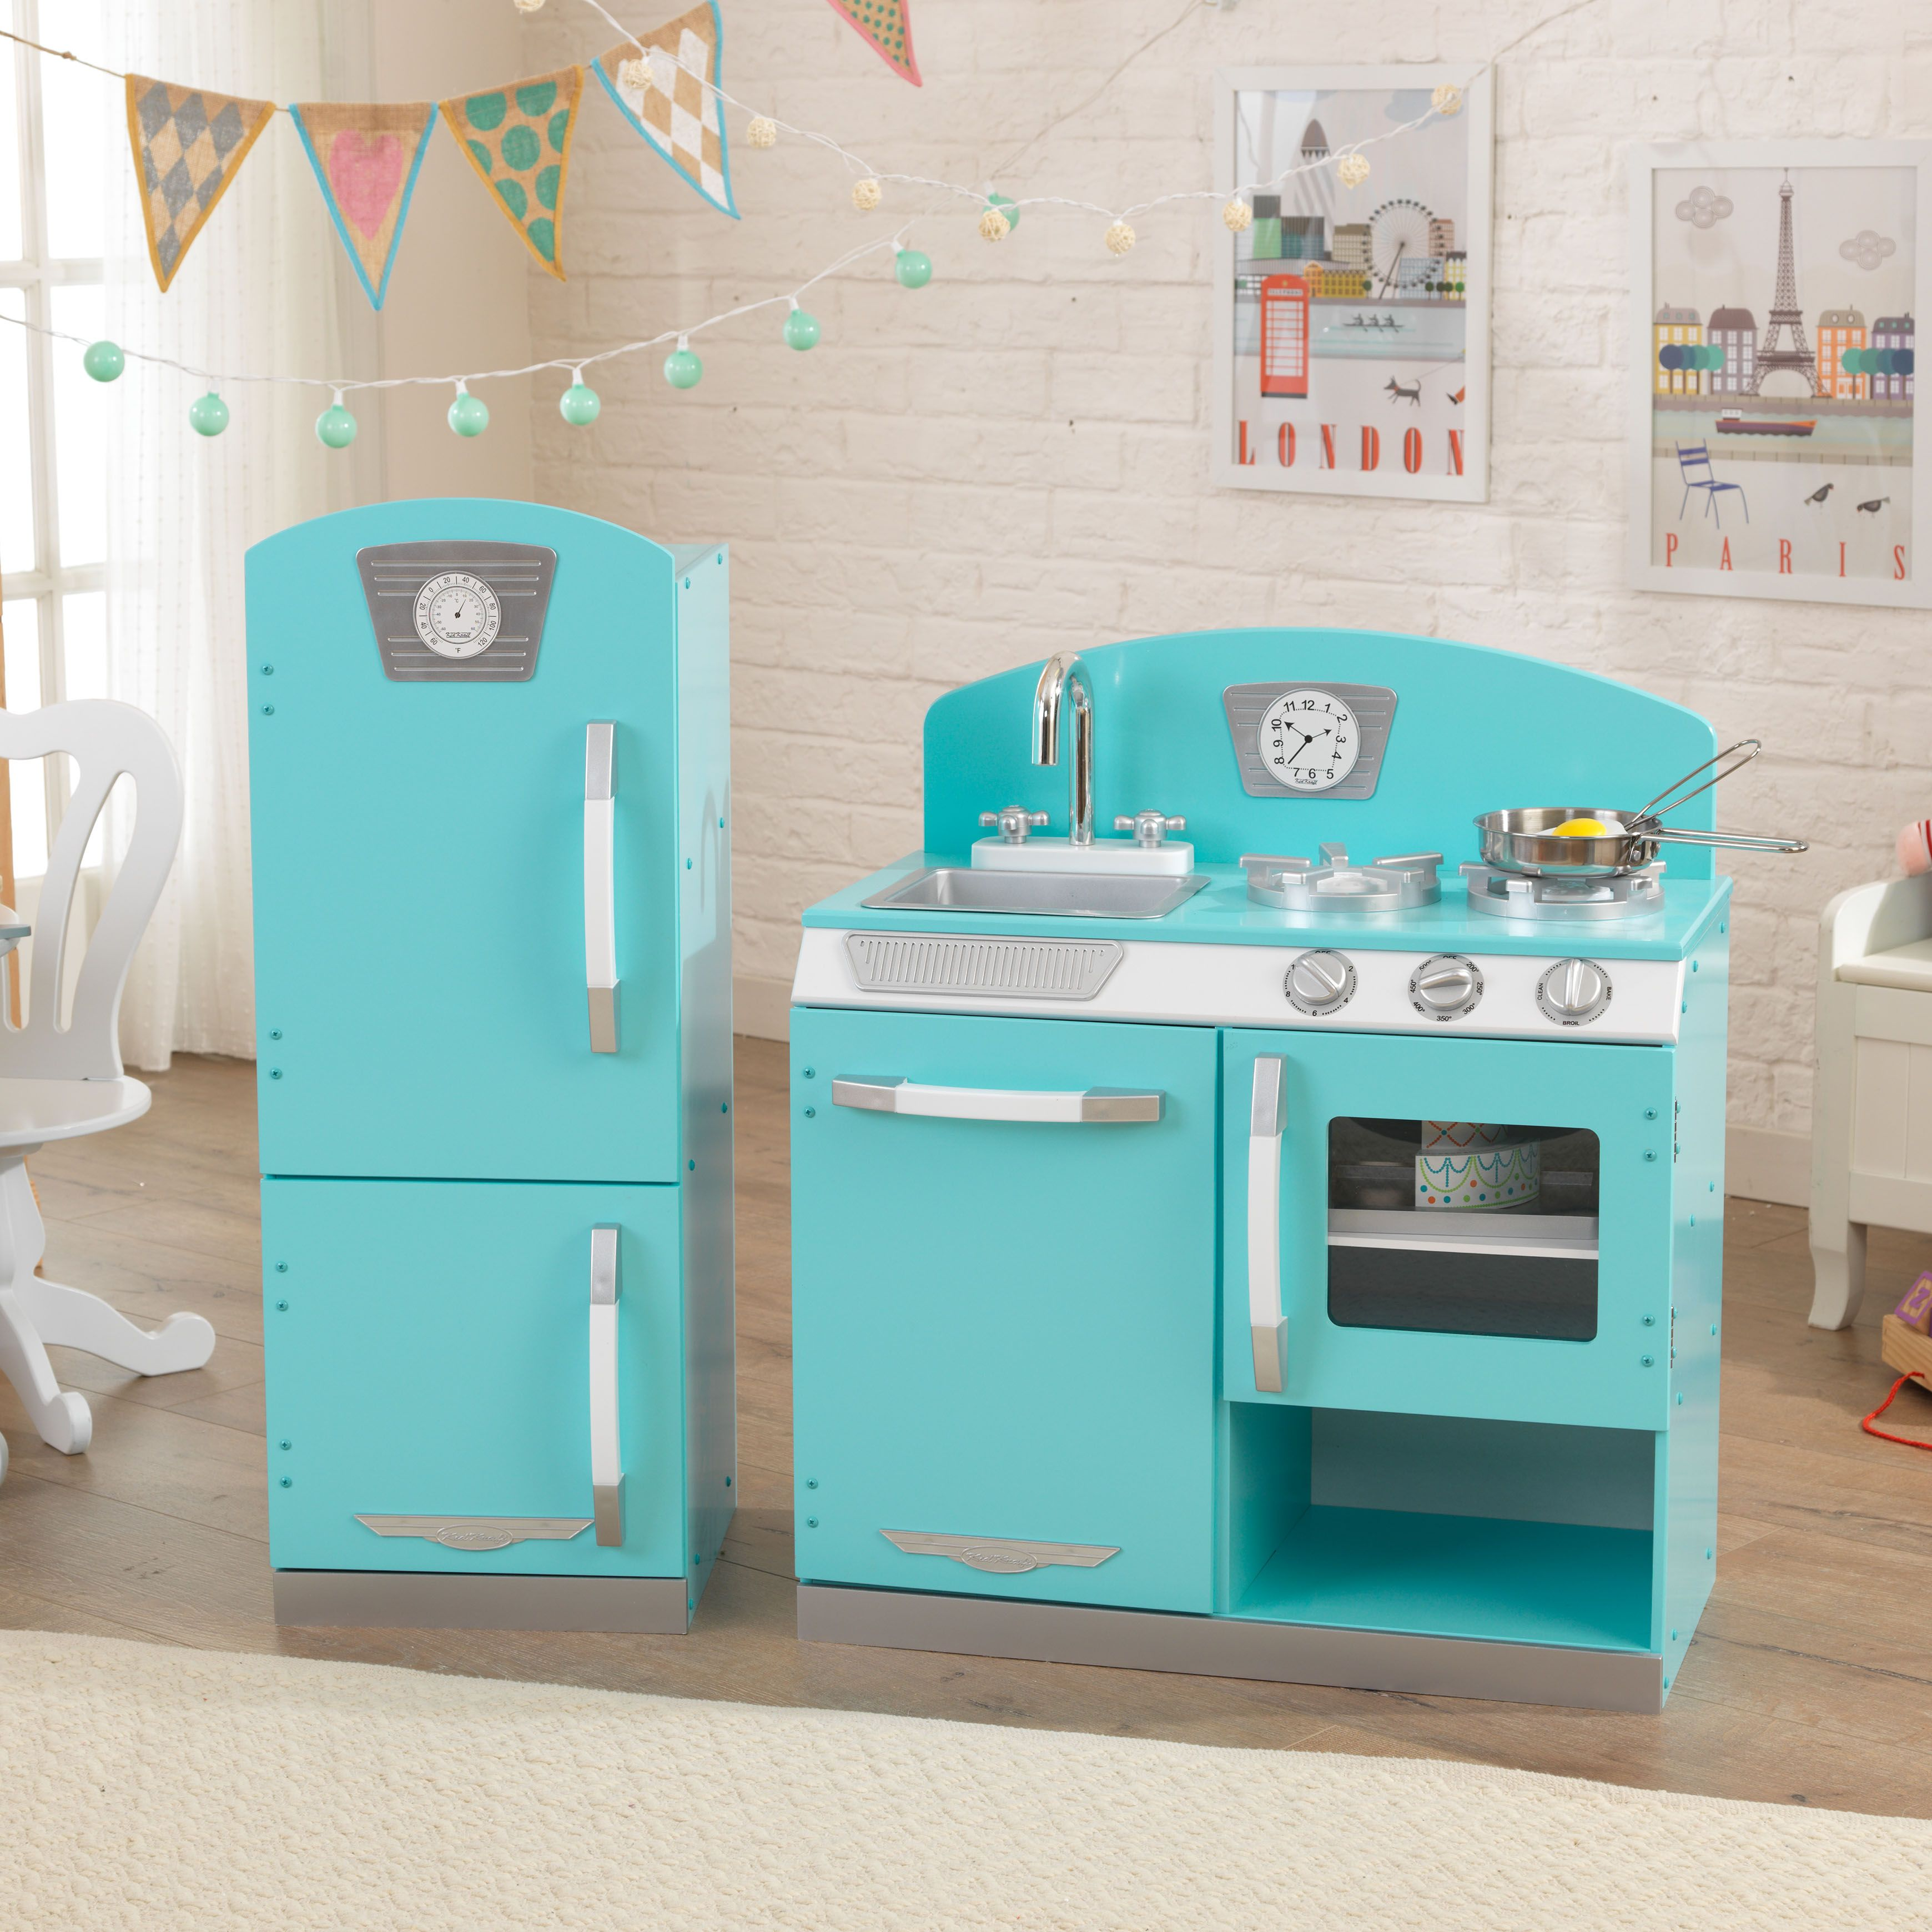 kidkraft retro kitchen and refrigerator in blue | kidkraft